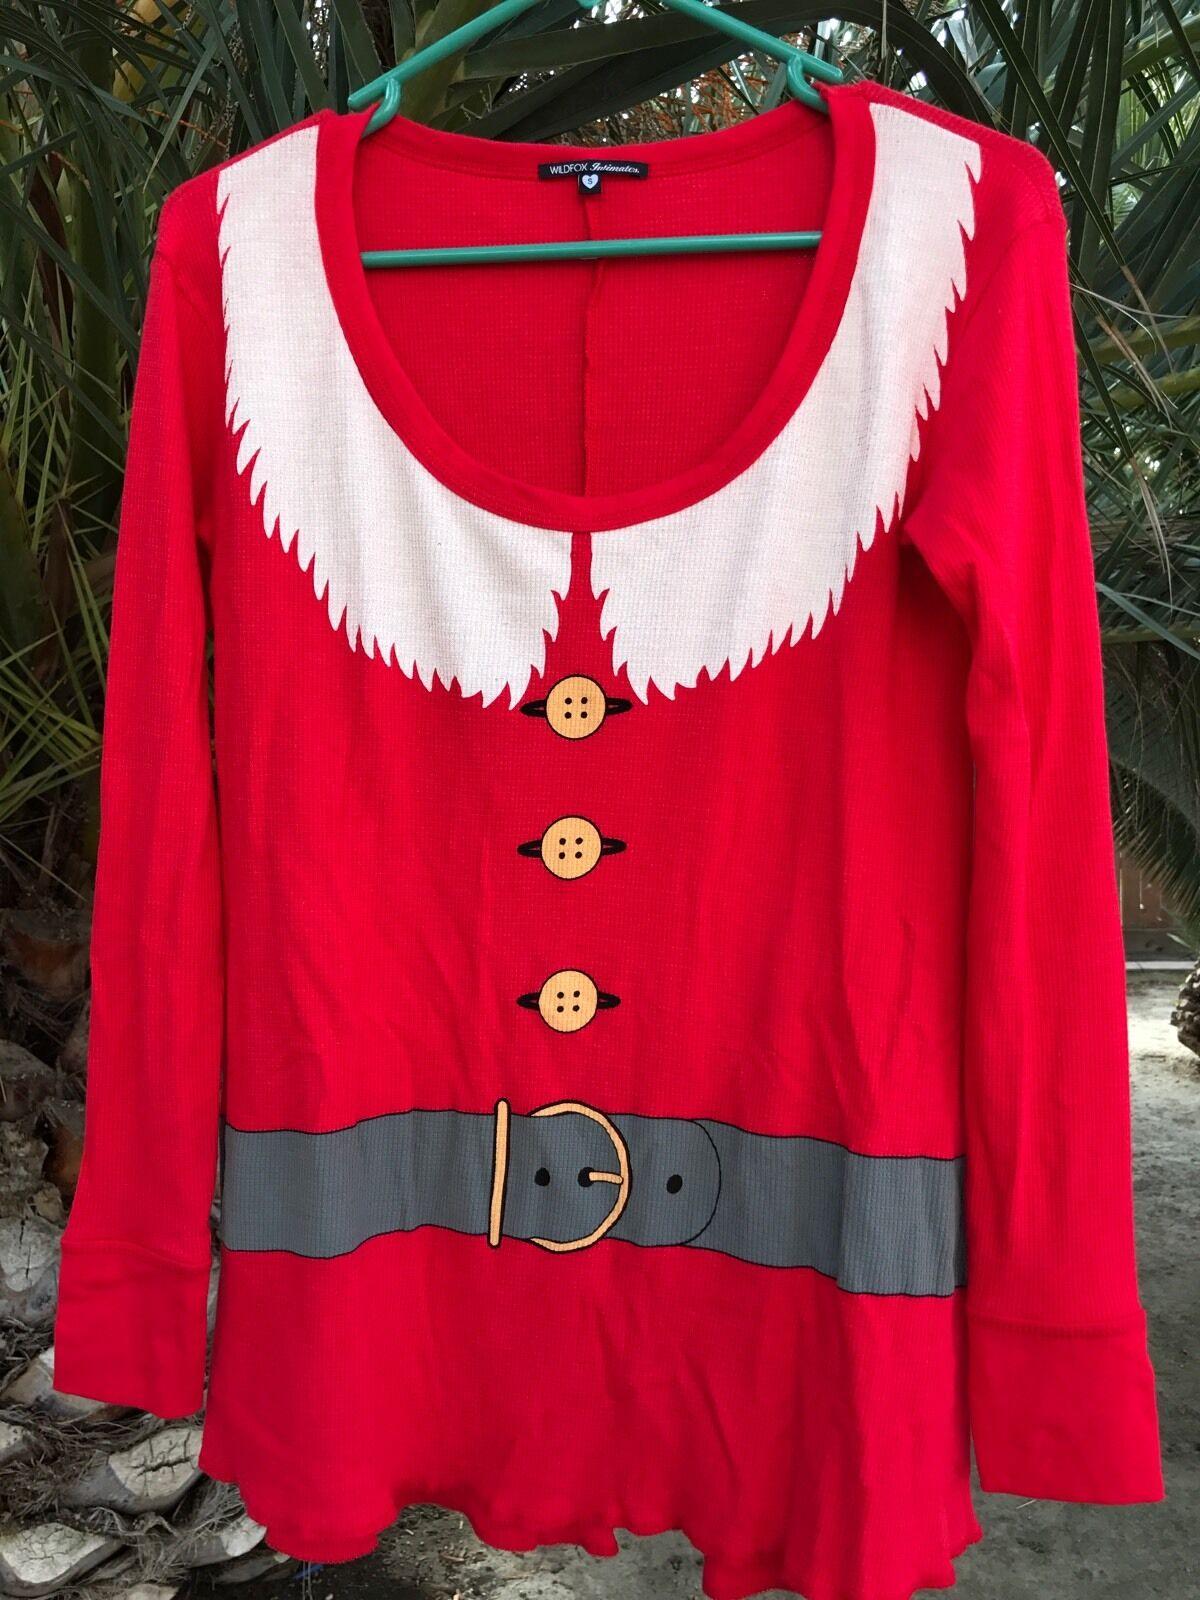 Wildfox  Mrs. Clause  NWOT Long Sleeve Tee T shirt Christmas Santa Holiday